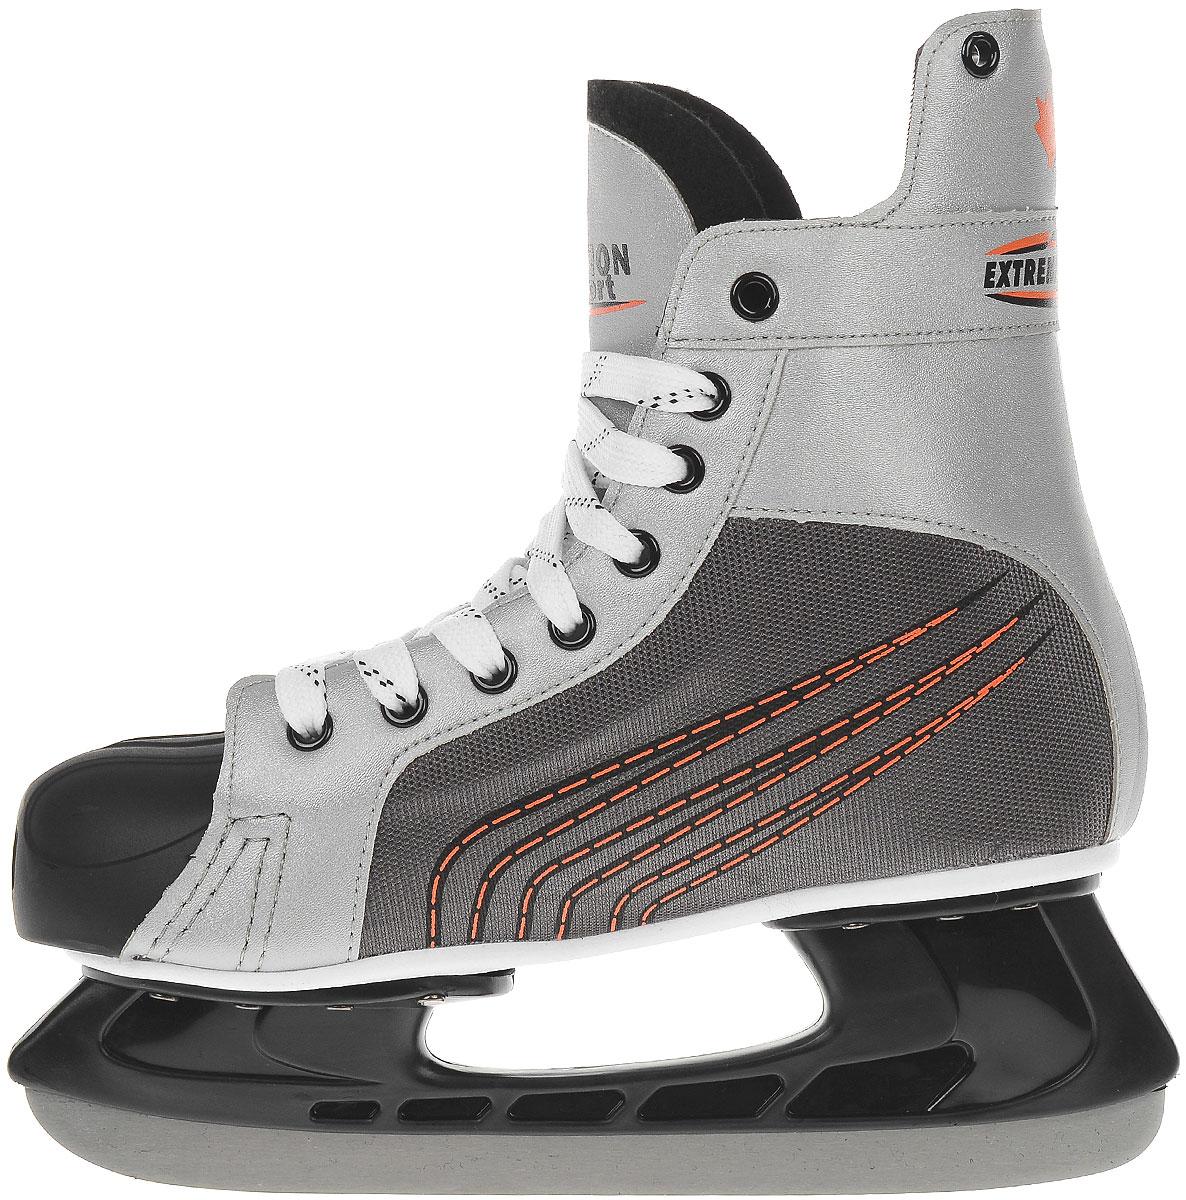 Коньки хоккейные мужские Action, цвет: белый, серый. PW-216N. Размер 39